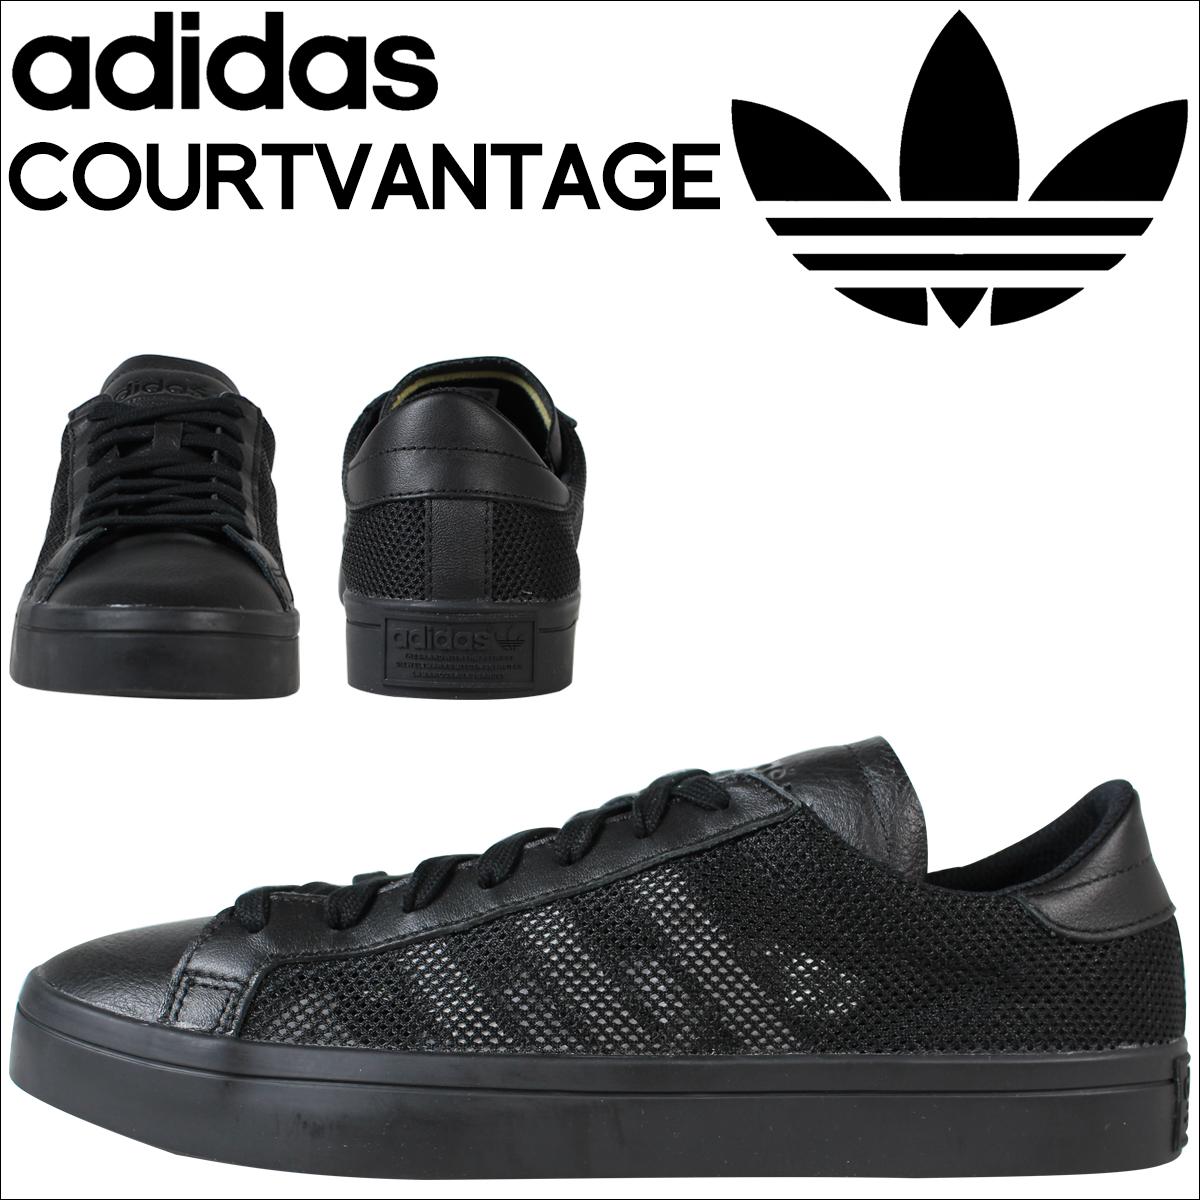 adidas originals court vantage black